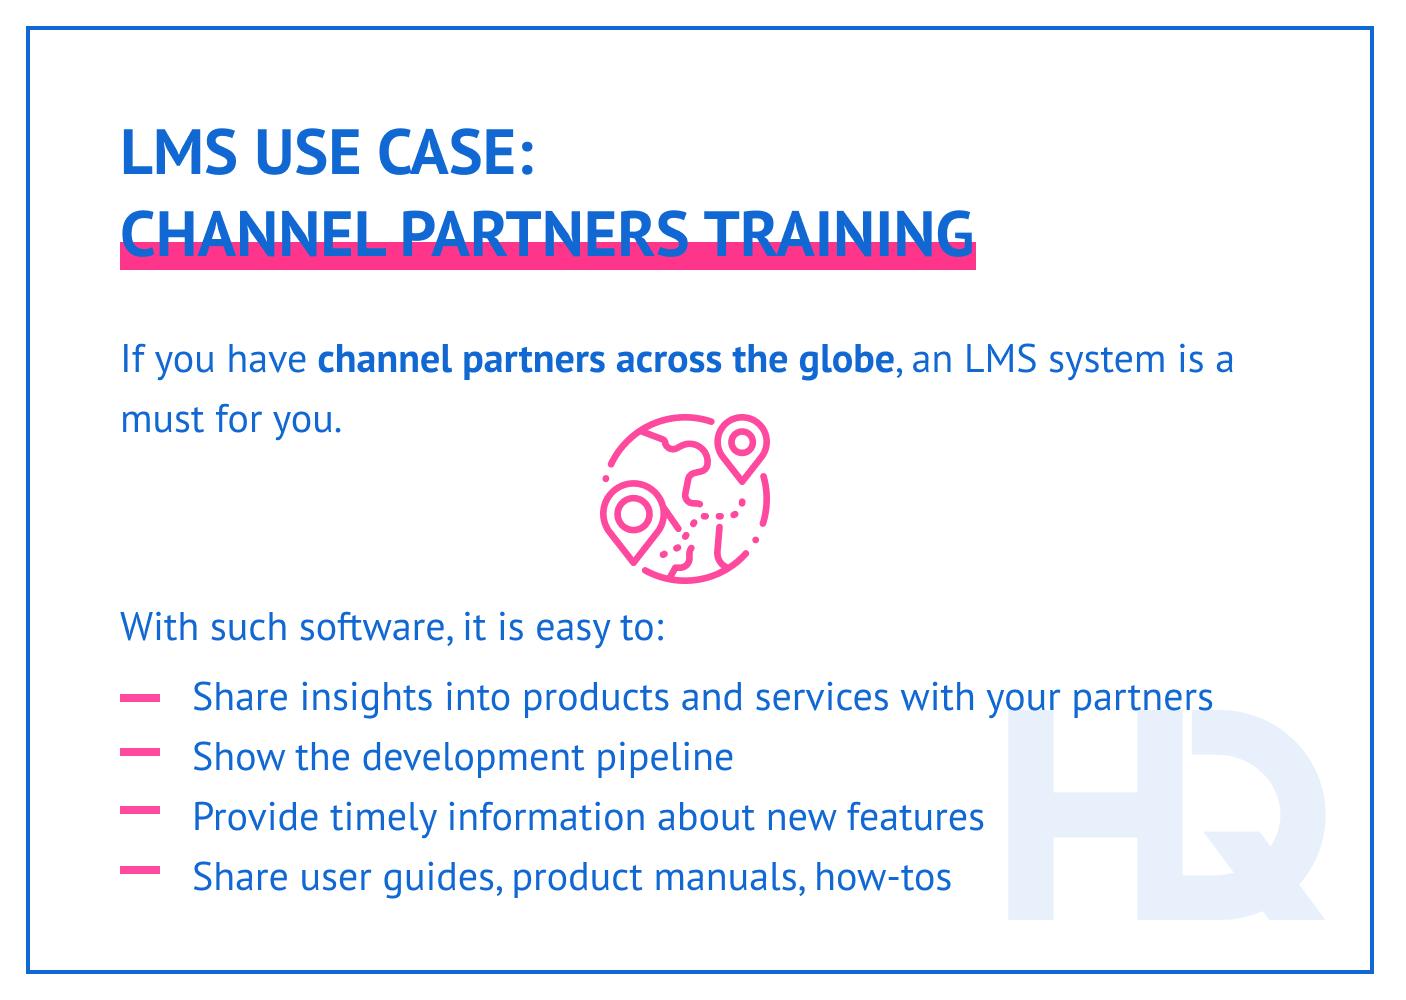 LMS use case: channel partner training